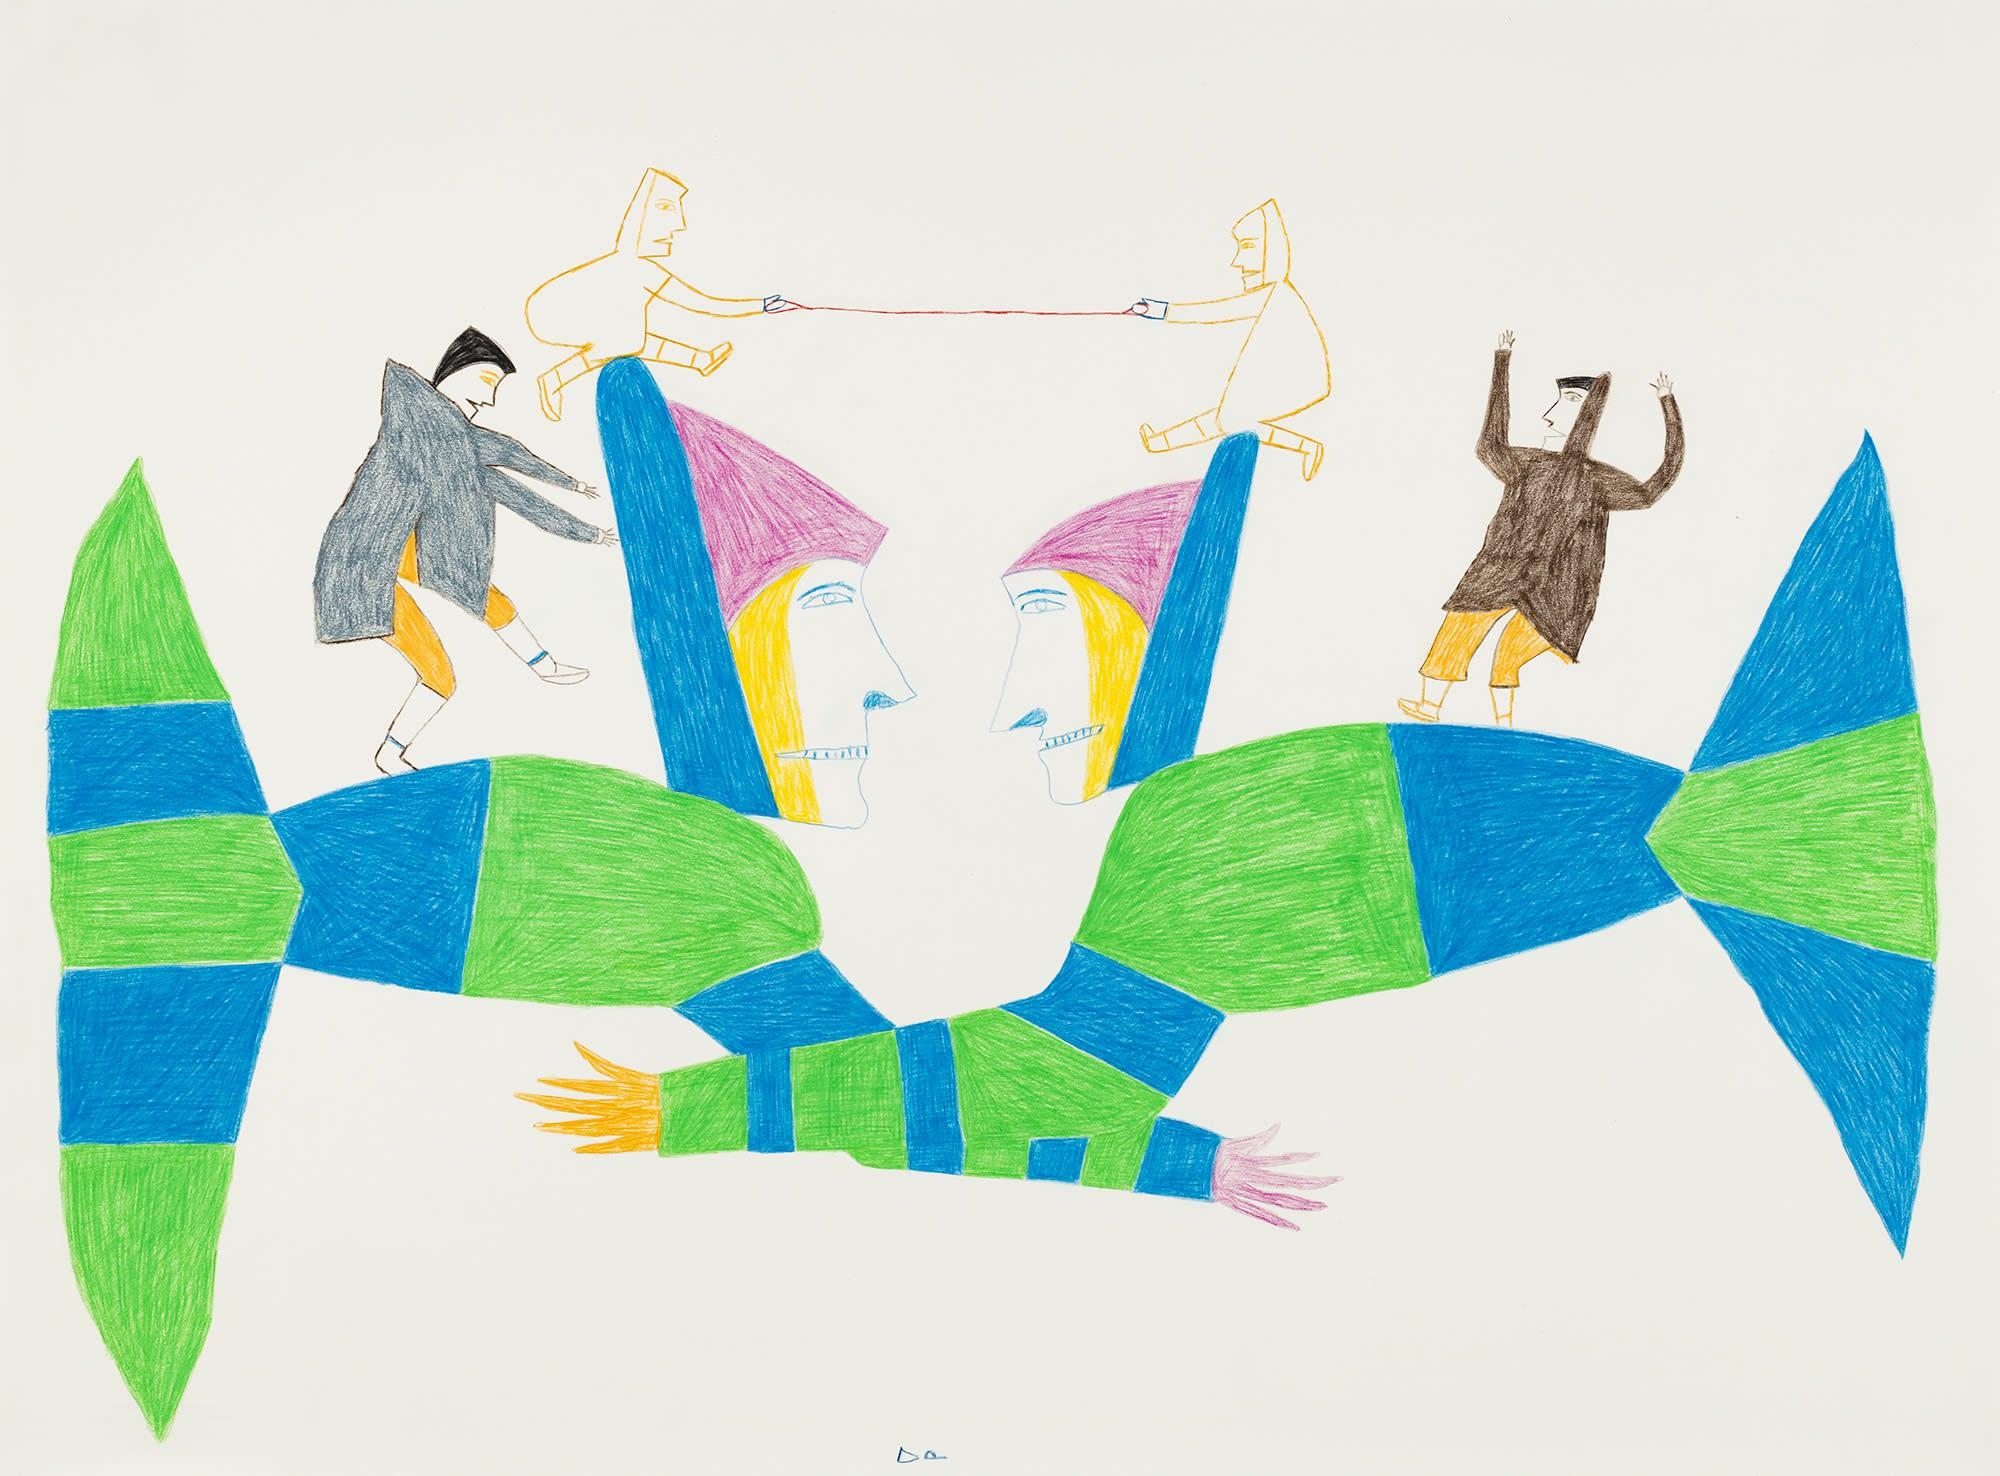 Lot 44, Jessie Oonark, Untitled Drawing